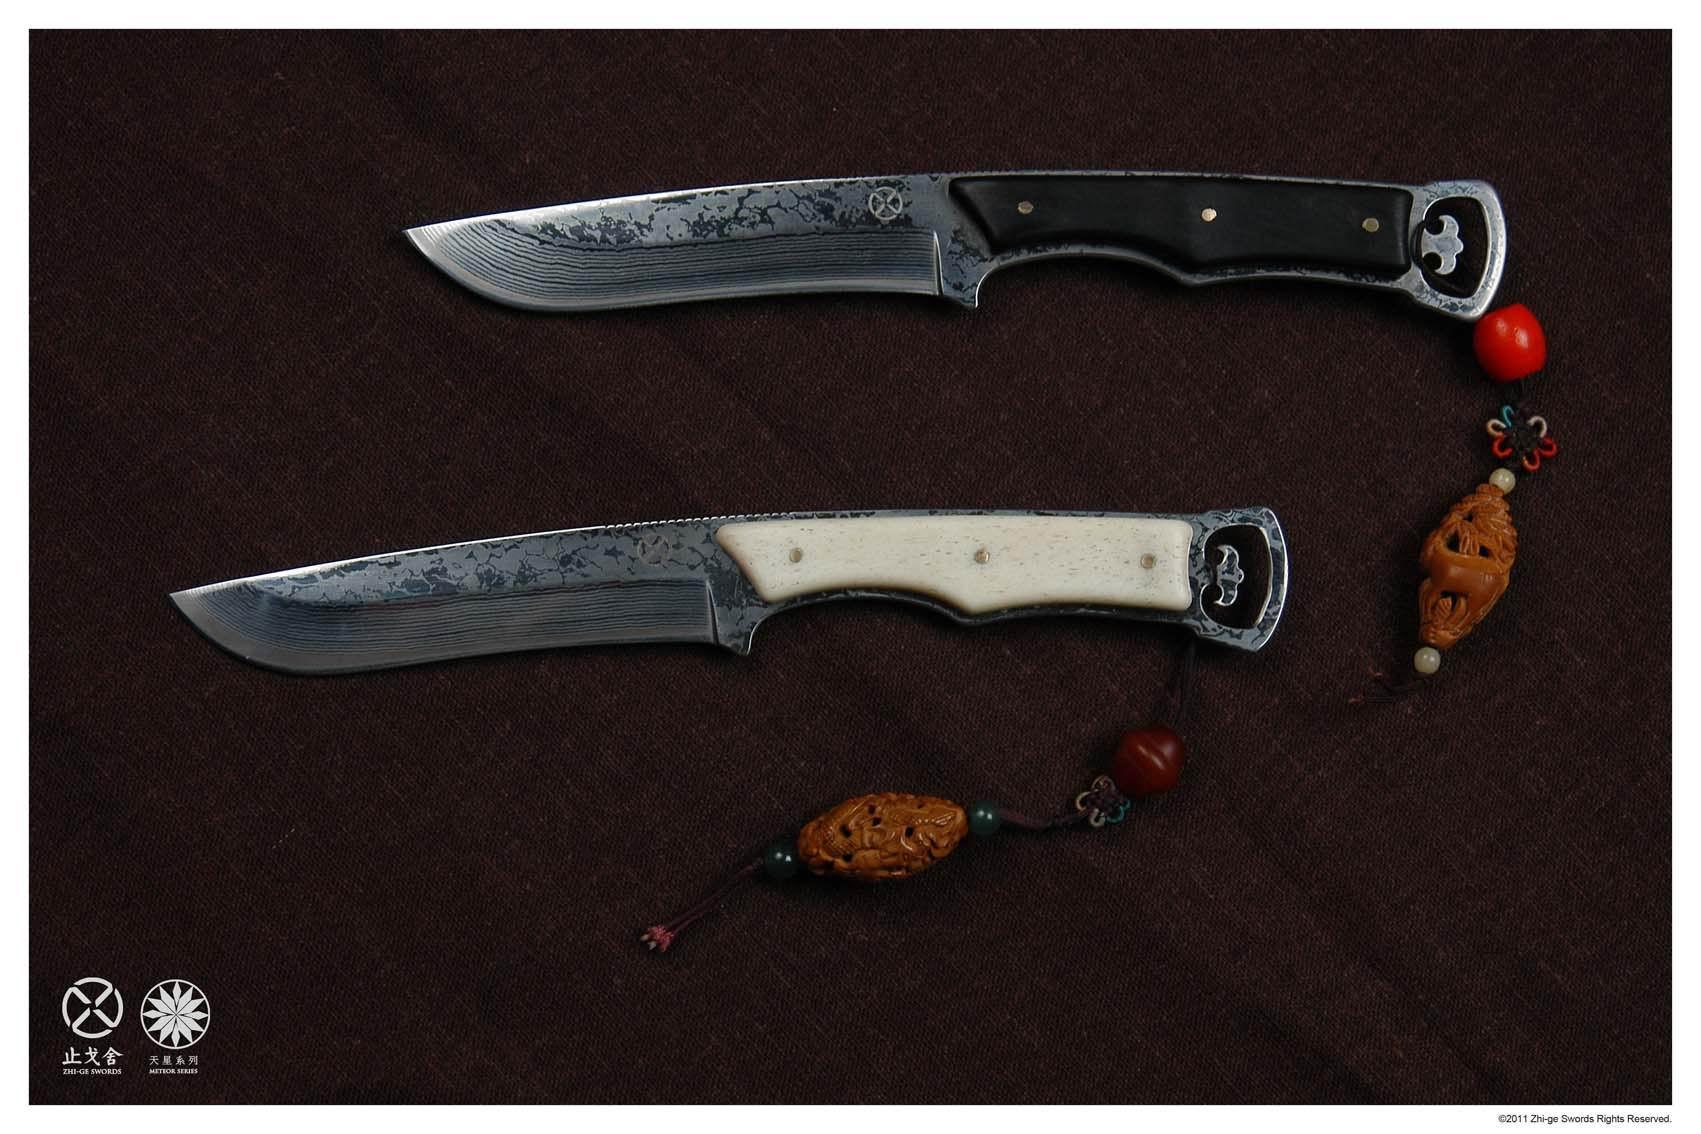 zhi-ge swords han silk 2.jpg